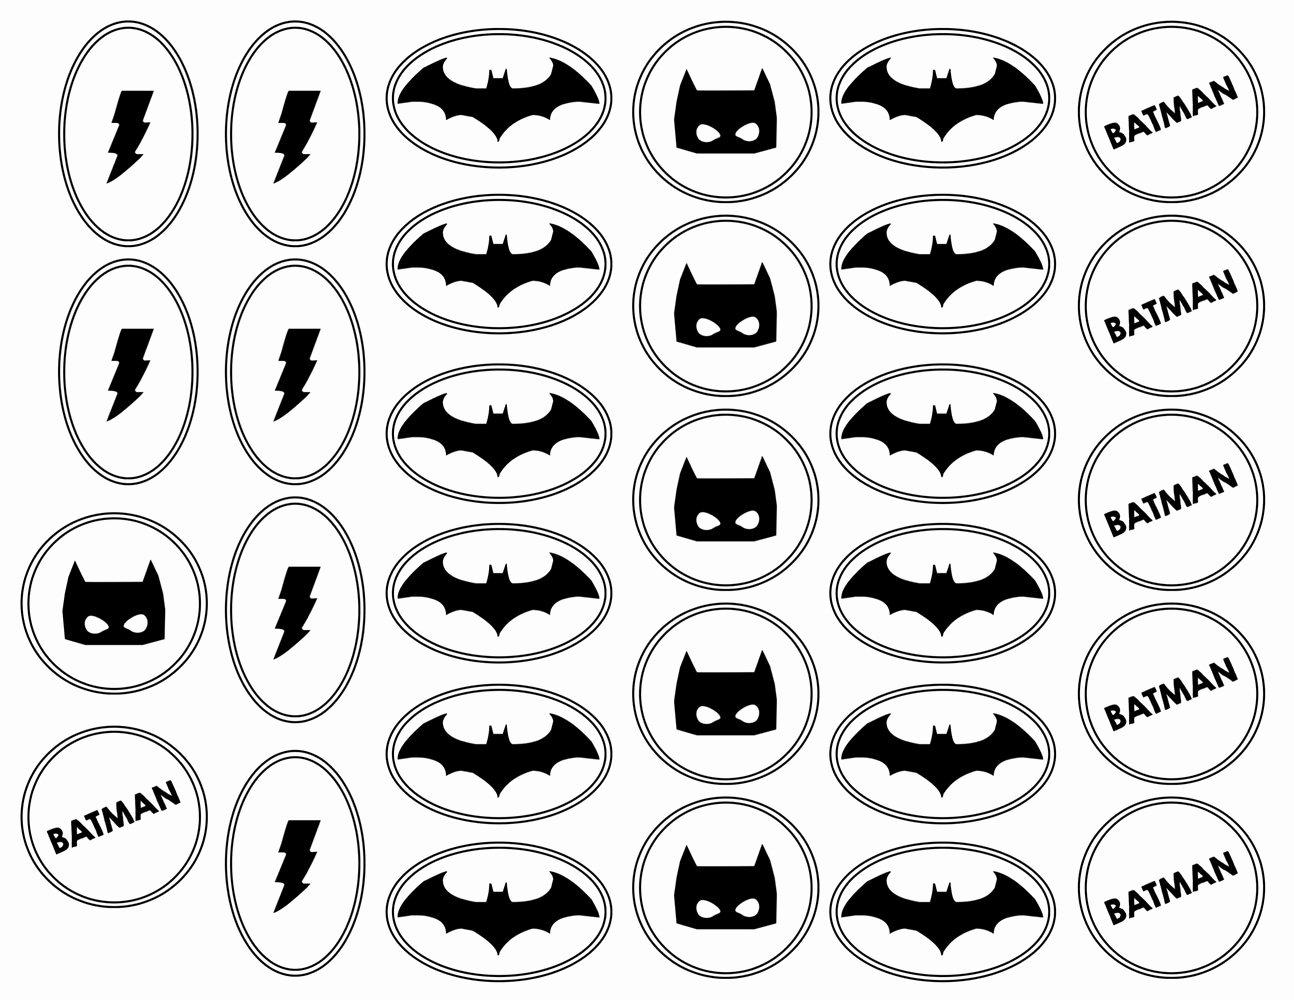 Batman Cake Template Unique Batman Cake topper Template Templates